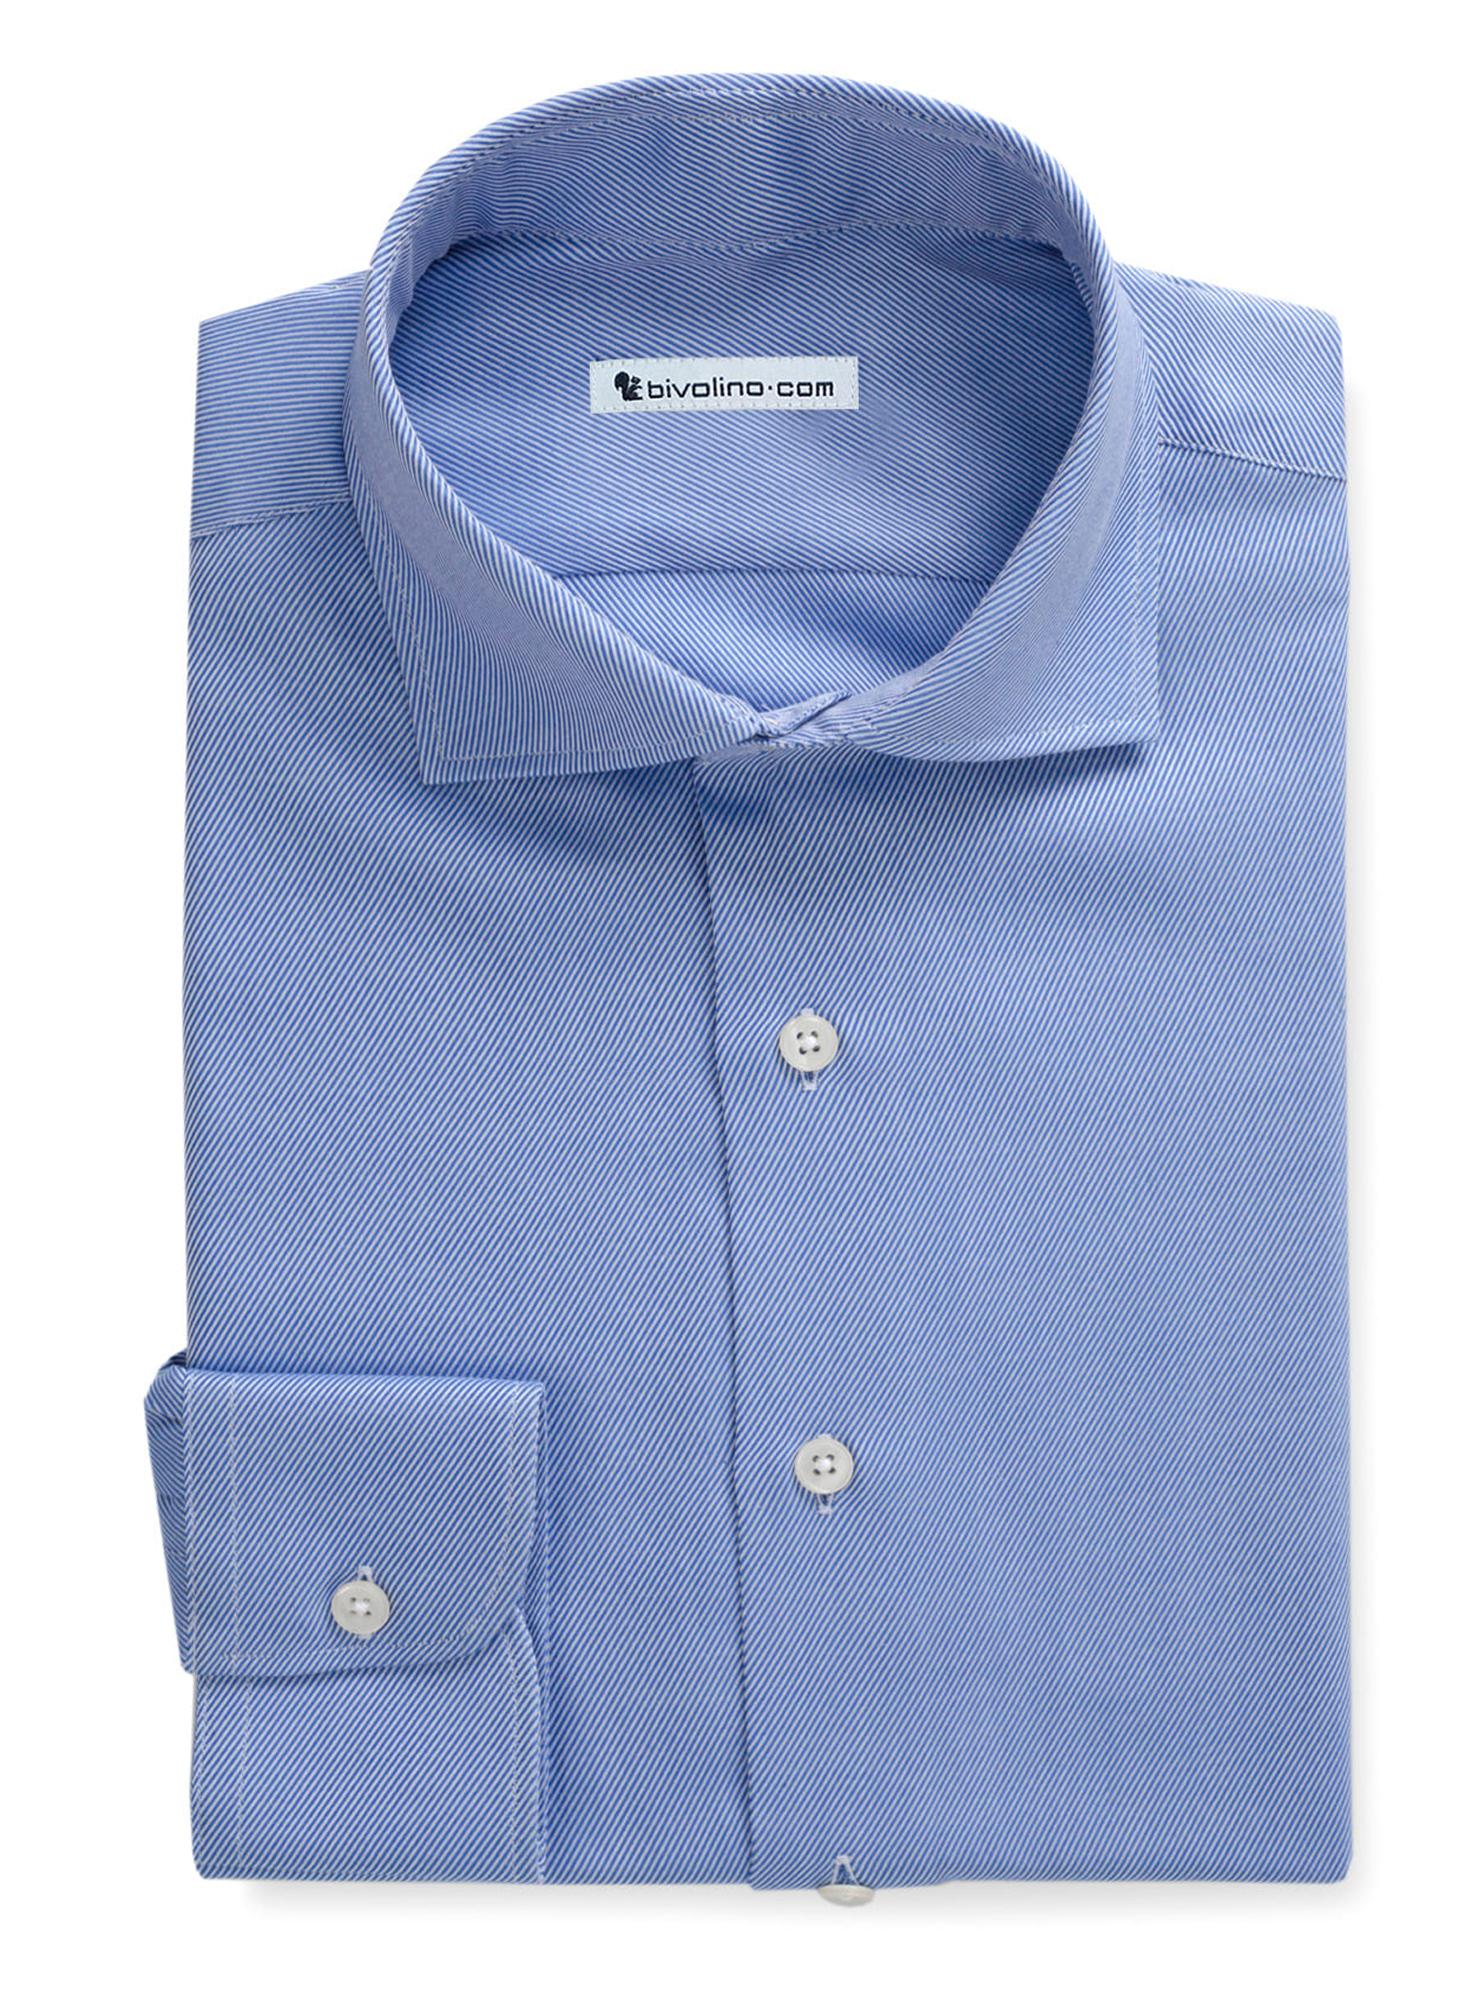 PERIGLIANO - Blauwe Twill overhemd  - ROCO 3